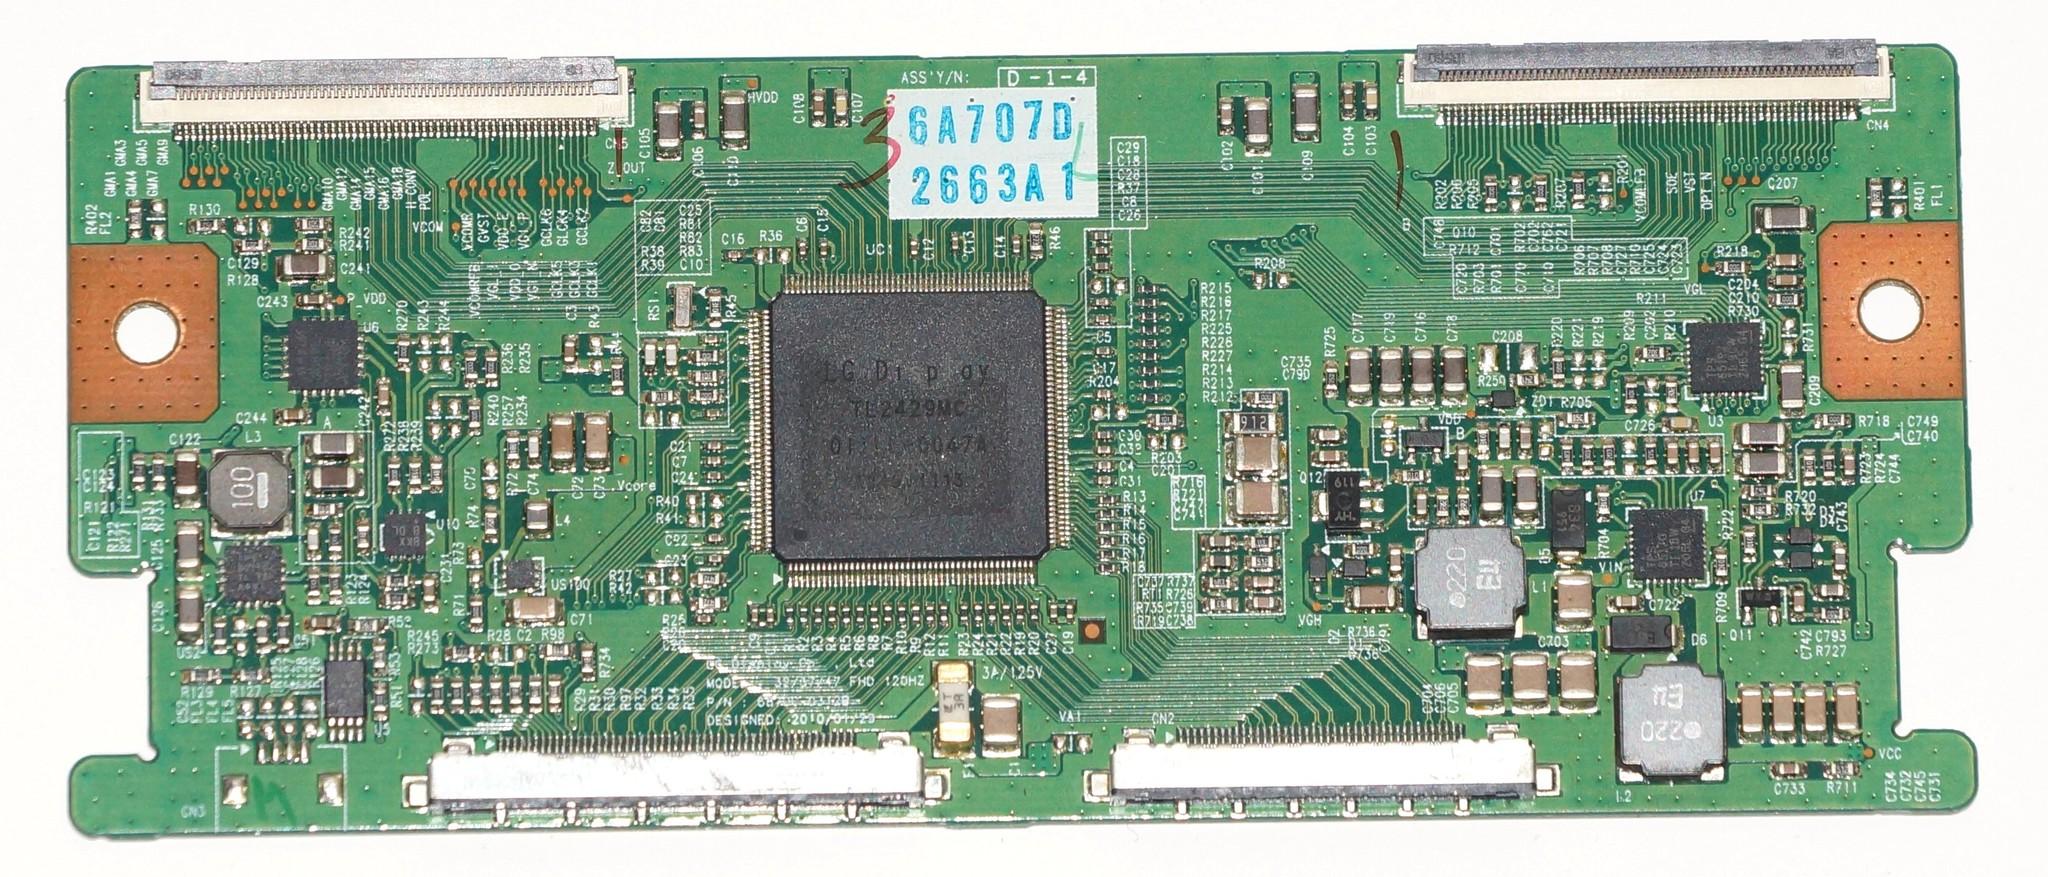 6870C-0312B t-con телевизора LG